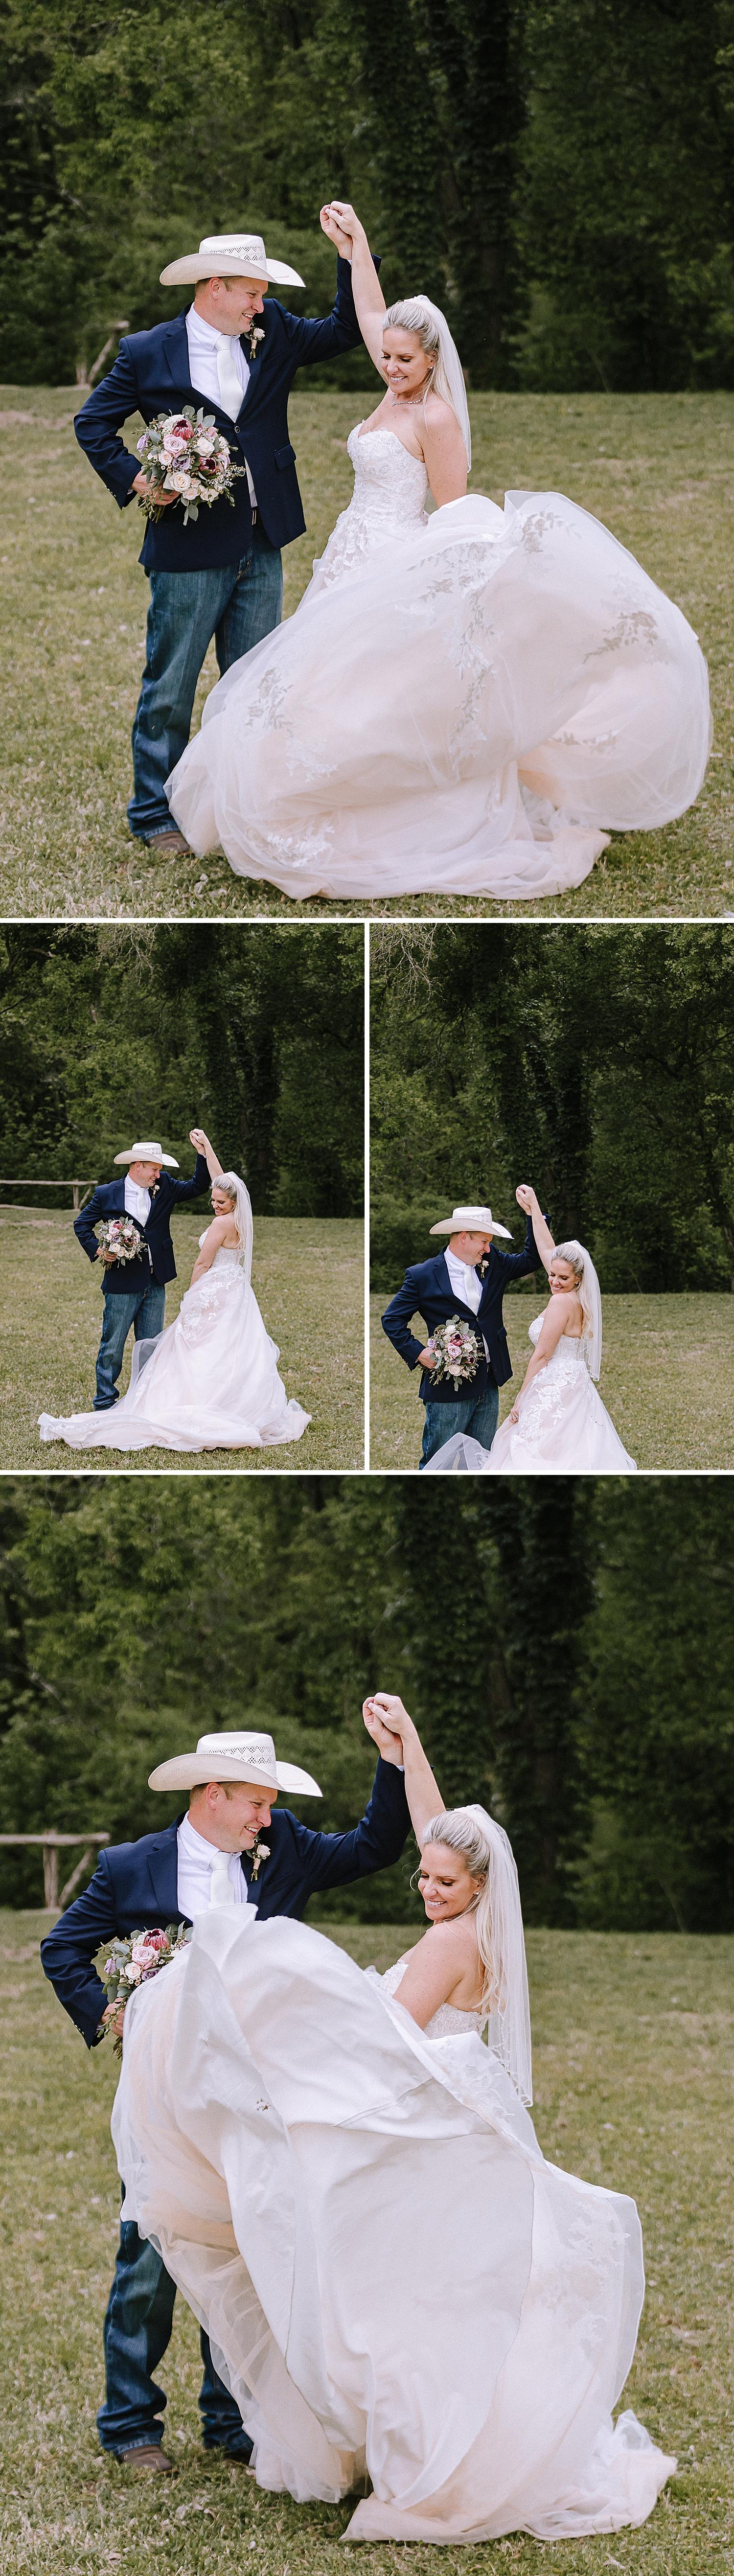 Rio-Cibilo-Ranch-Marion-Texas-Wedding-Rustic-Blush-Rose-Quartz-Details-Carly-Barton-Photography_0059.jpg